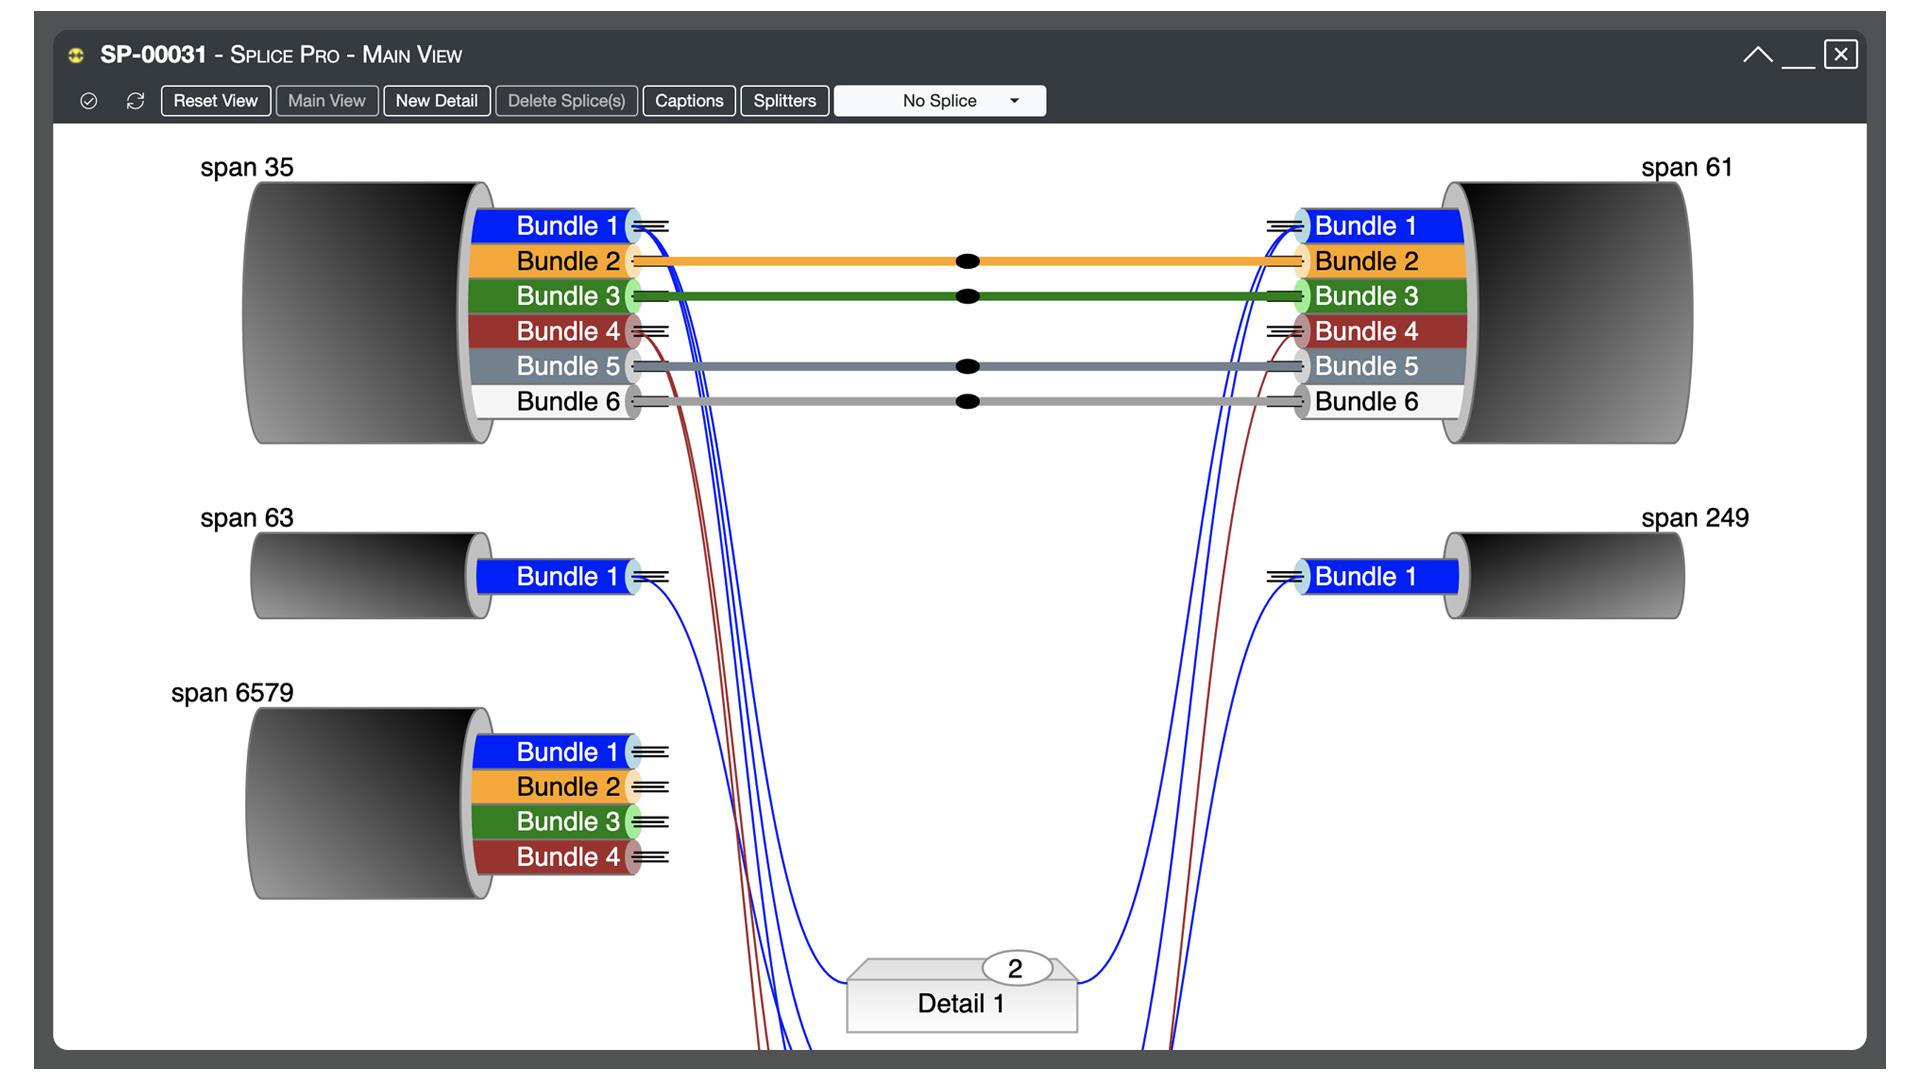 OSPInsight Web - Version 9.12.0 - Splice Pro (Window)_v02